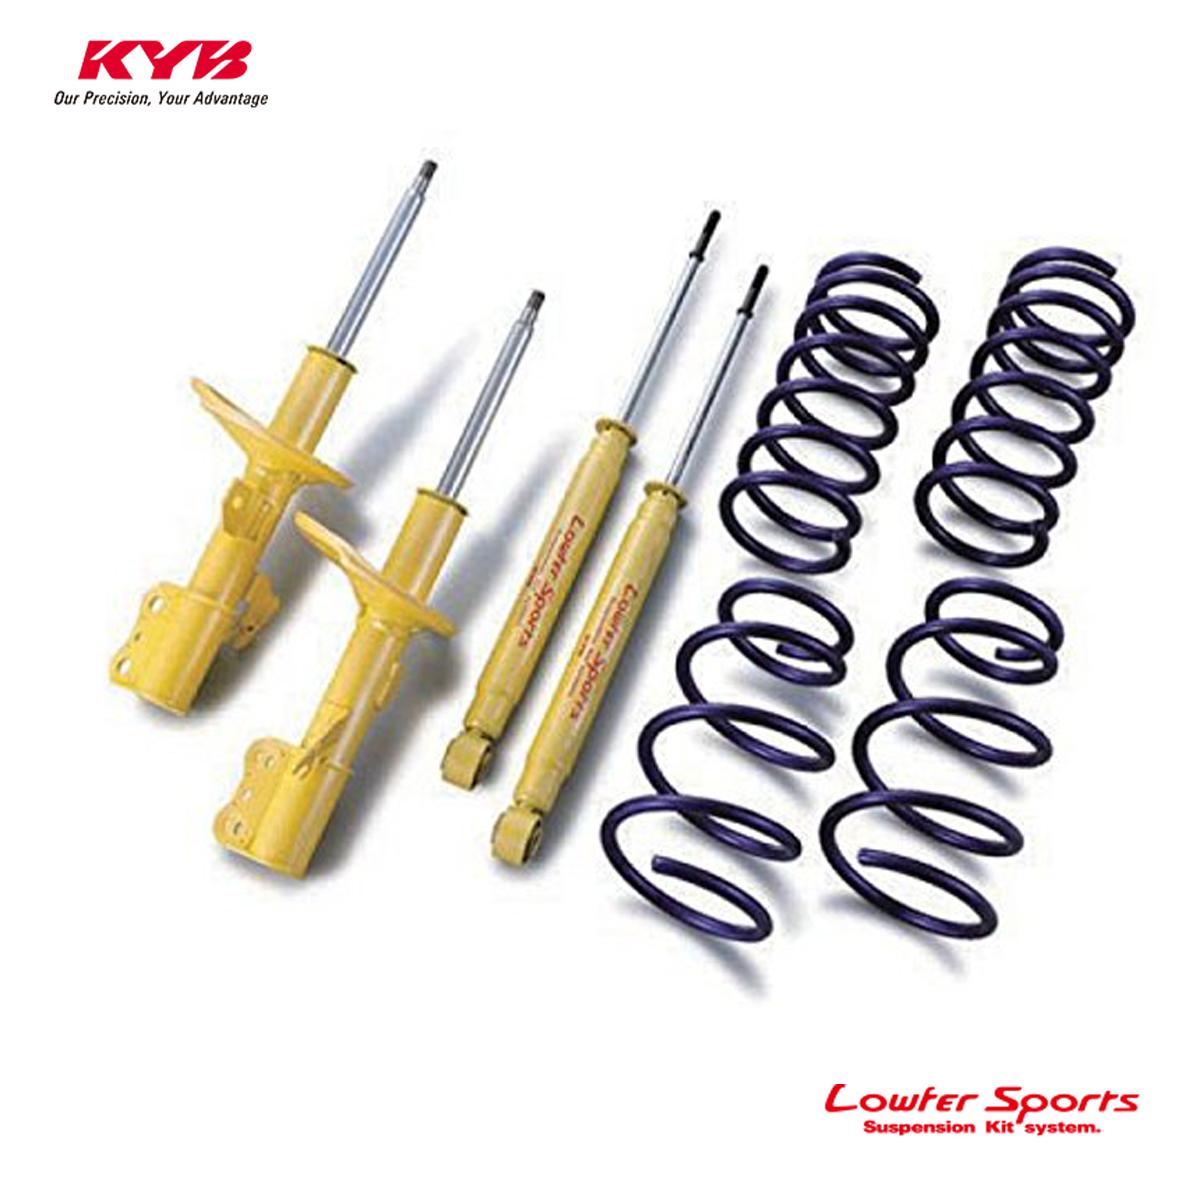 KYB カヤバ ヴィッツ KSP130/NSP130/NCP131 ショックアブソーバー サスペンションキット 1台分 ローファースポーツ キット Lowfer Sports LKIT-KSP130